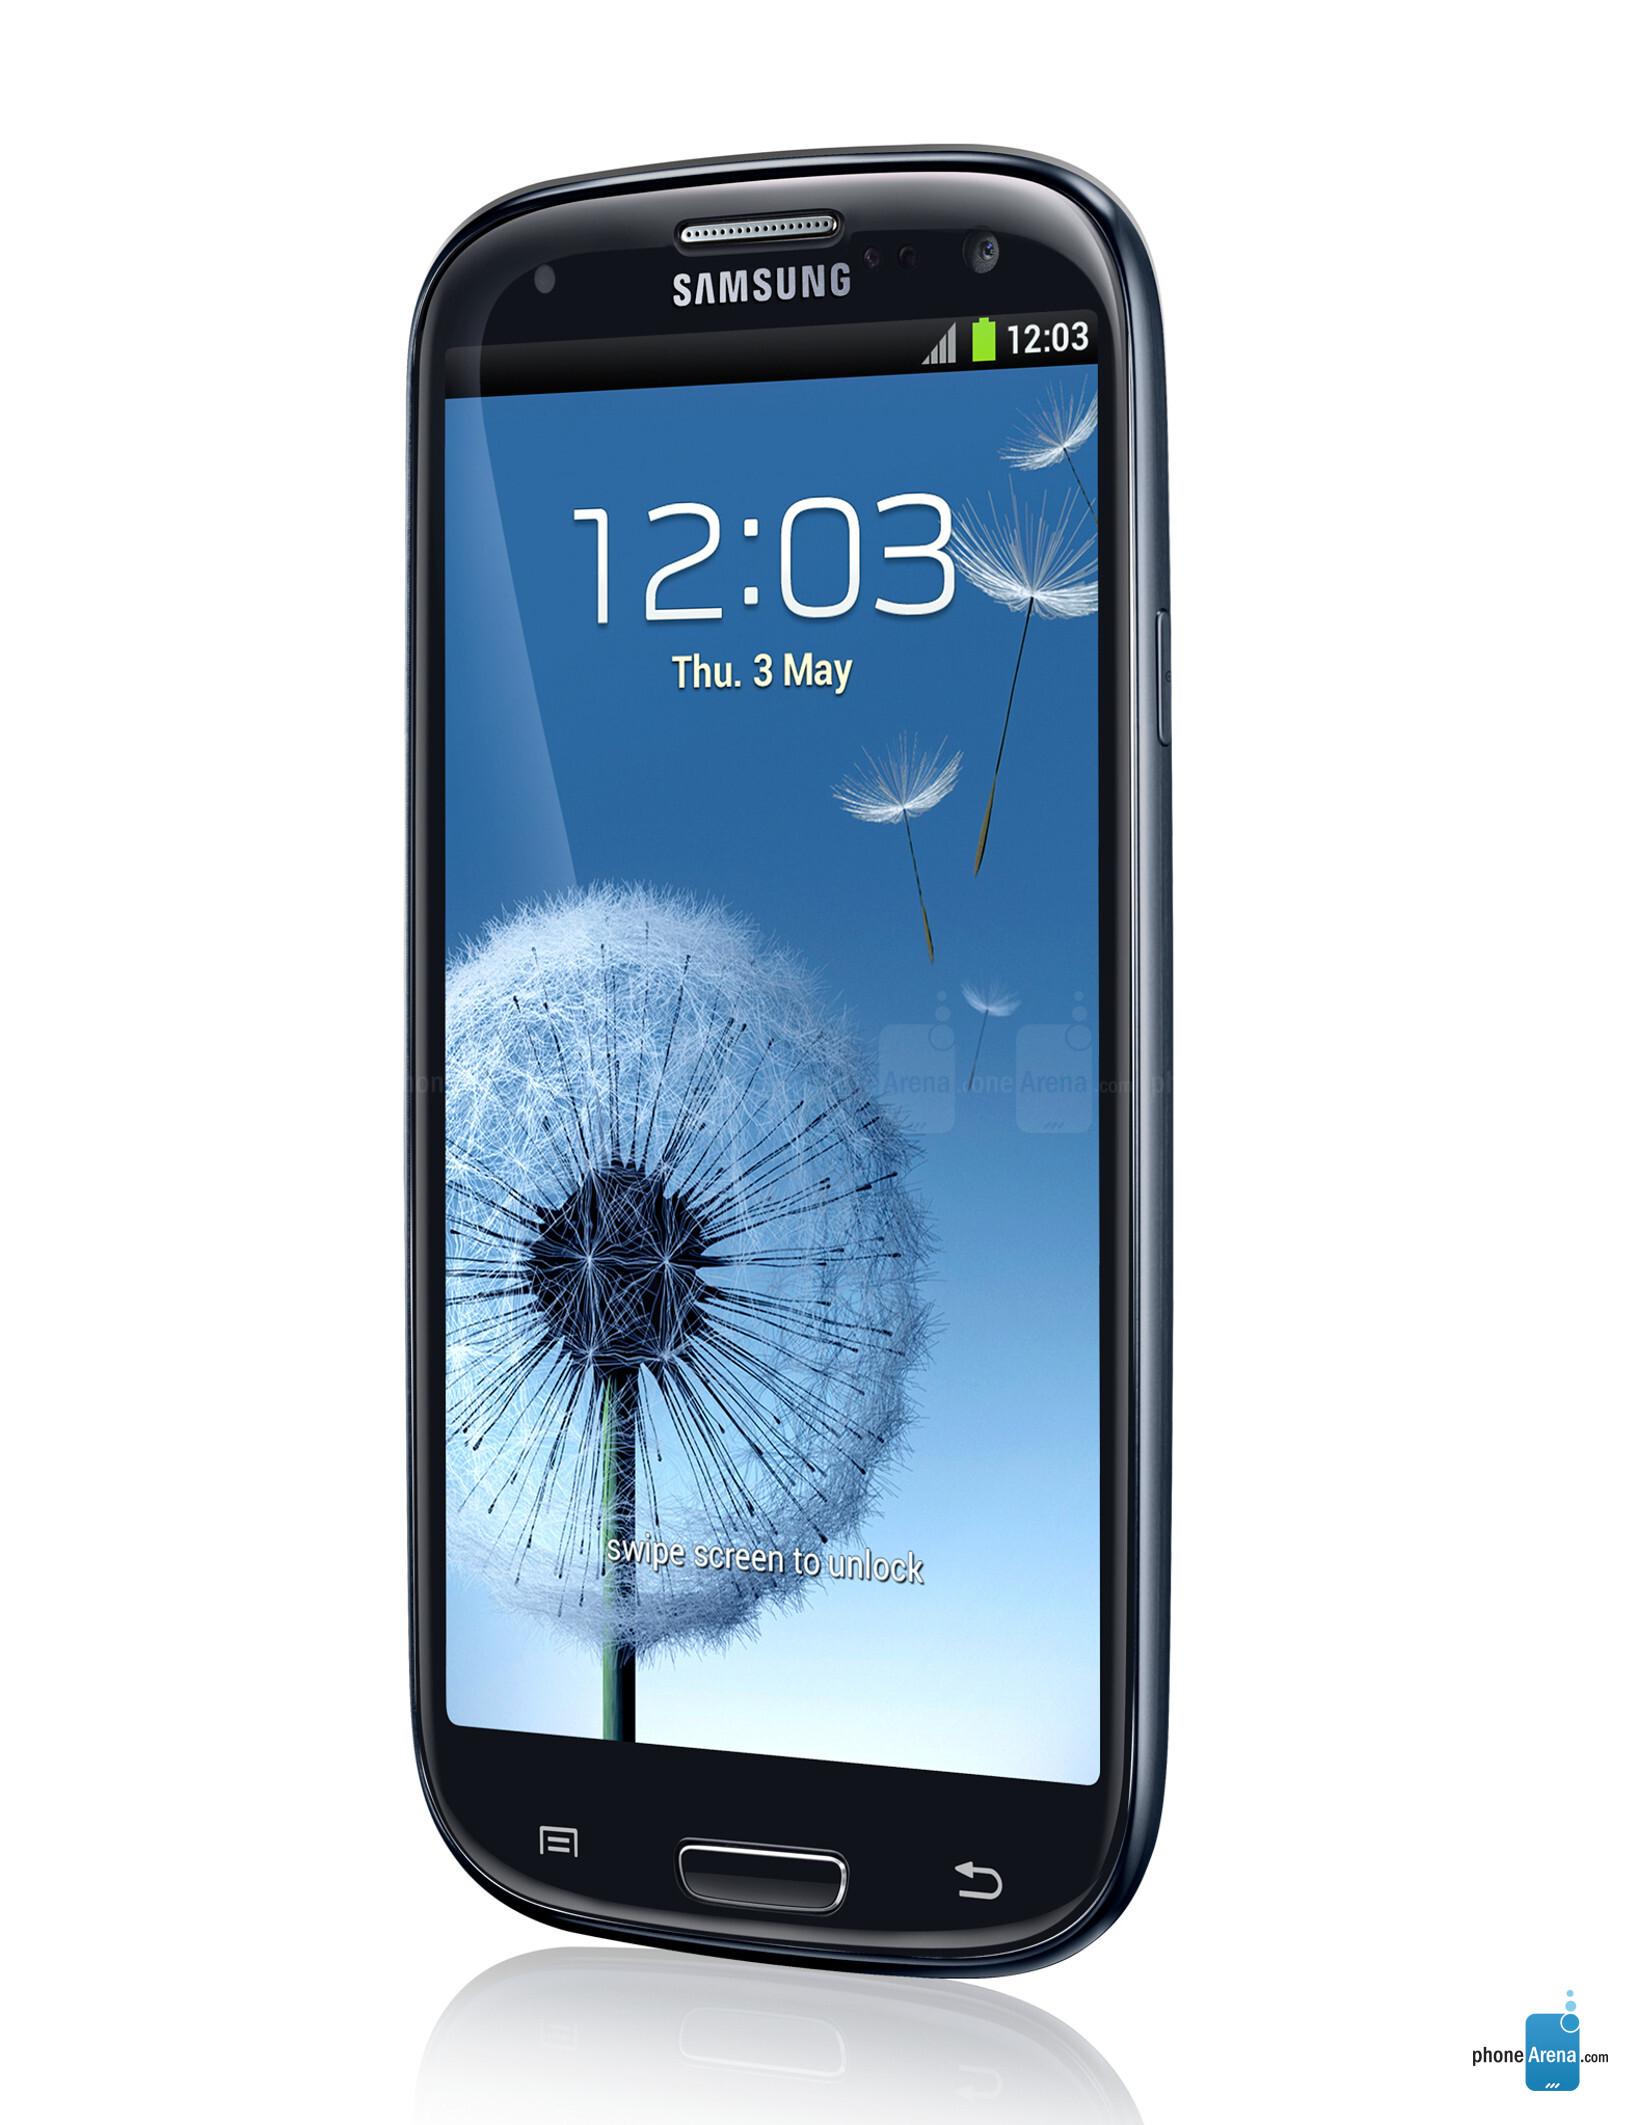 Samsung Galaxy S3 Neo Specs